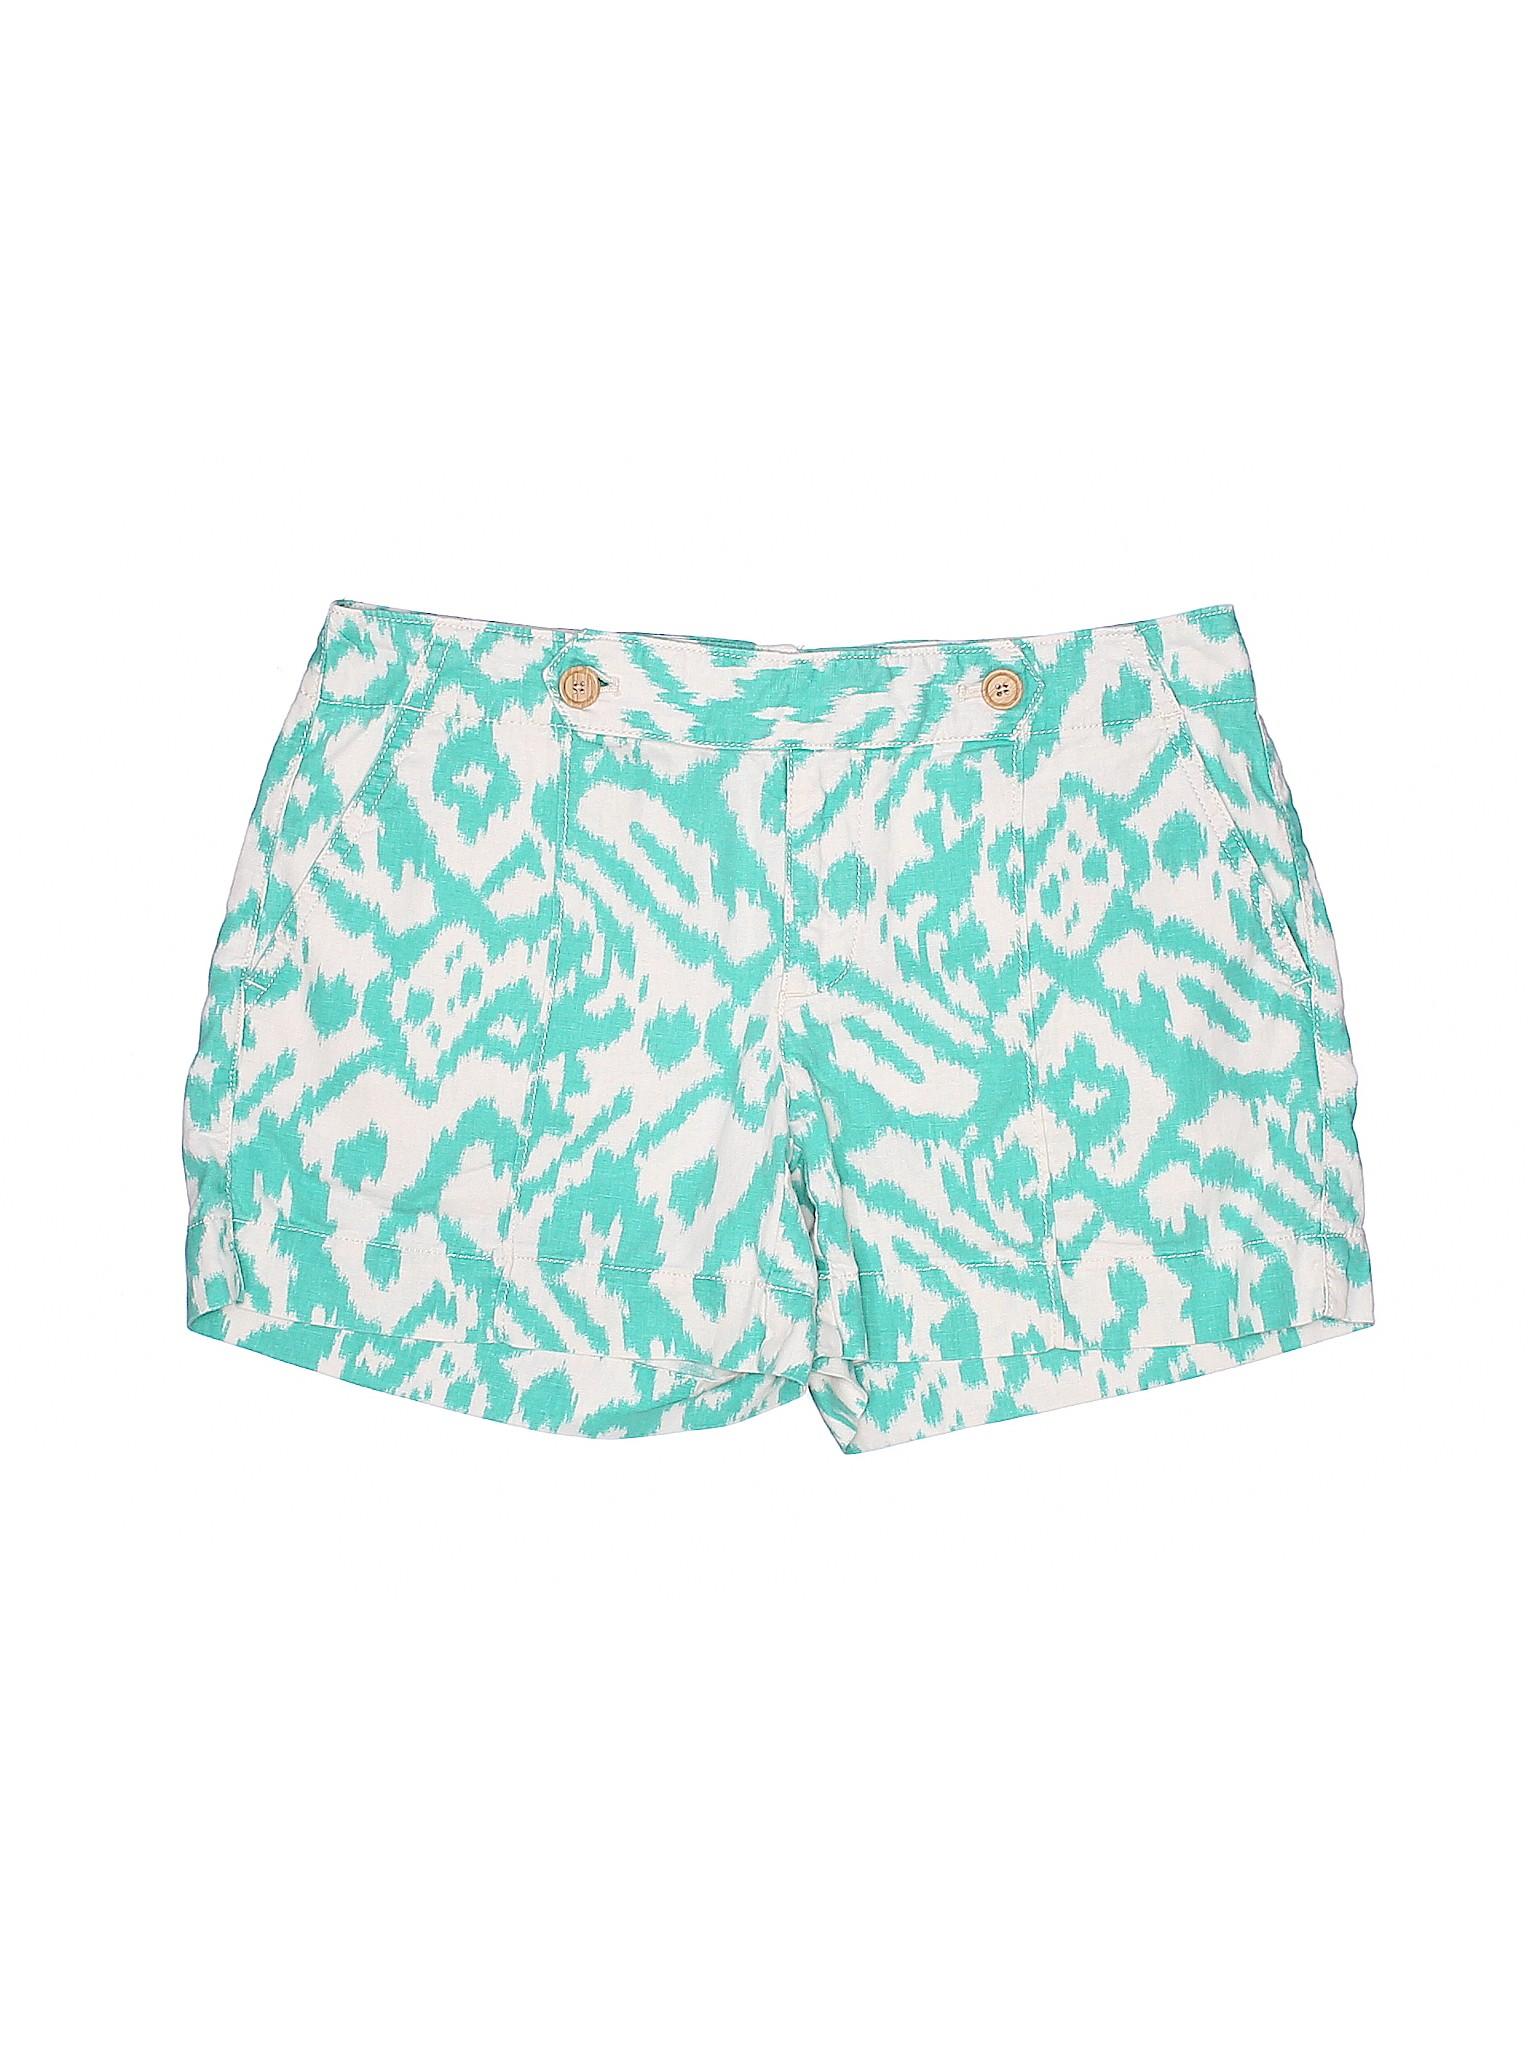 Shorts leisure Taylor LOFT Ann Boutique wOfqYdIx